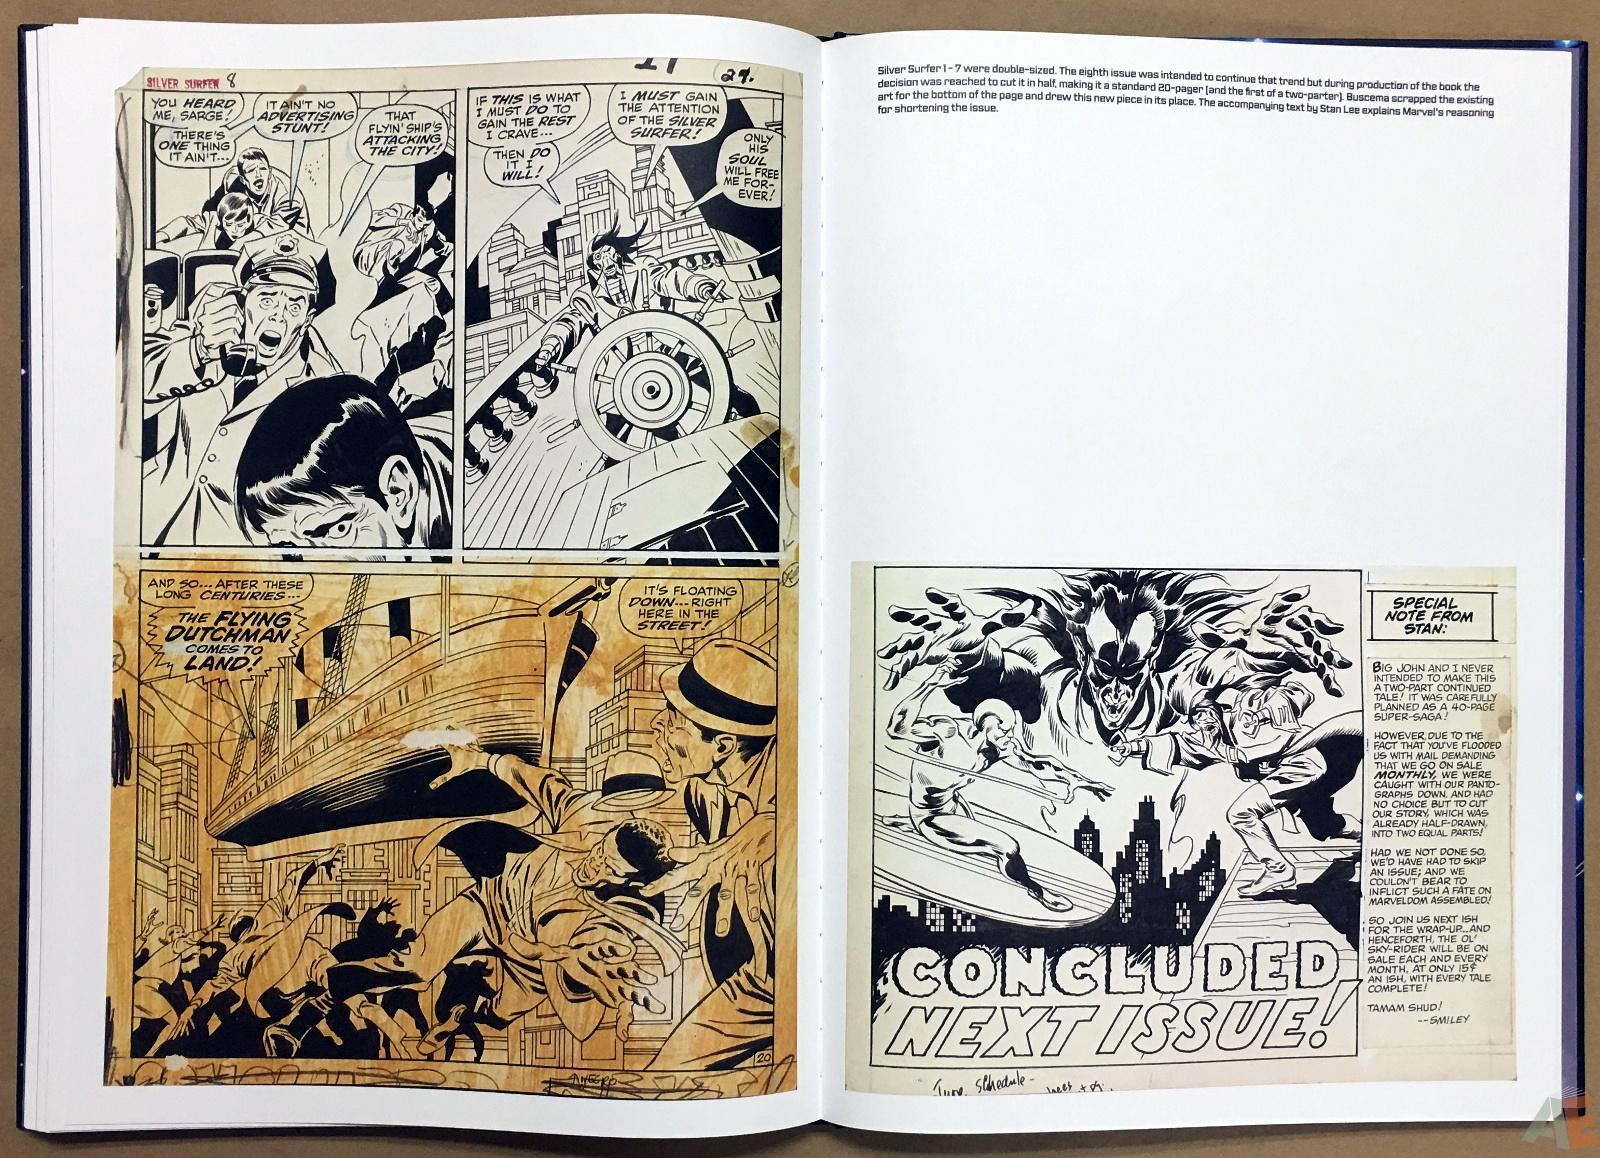 John Buscema's Silver Surfer Artist's Edition 30